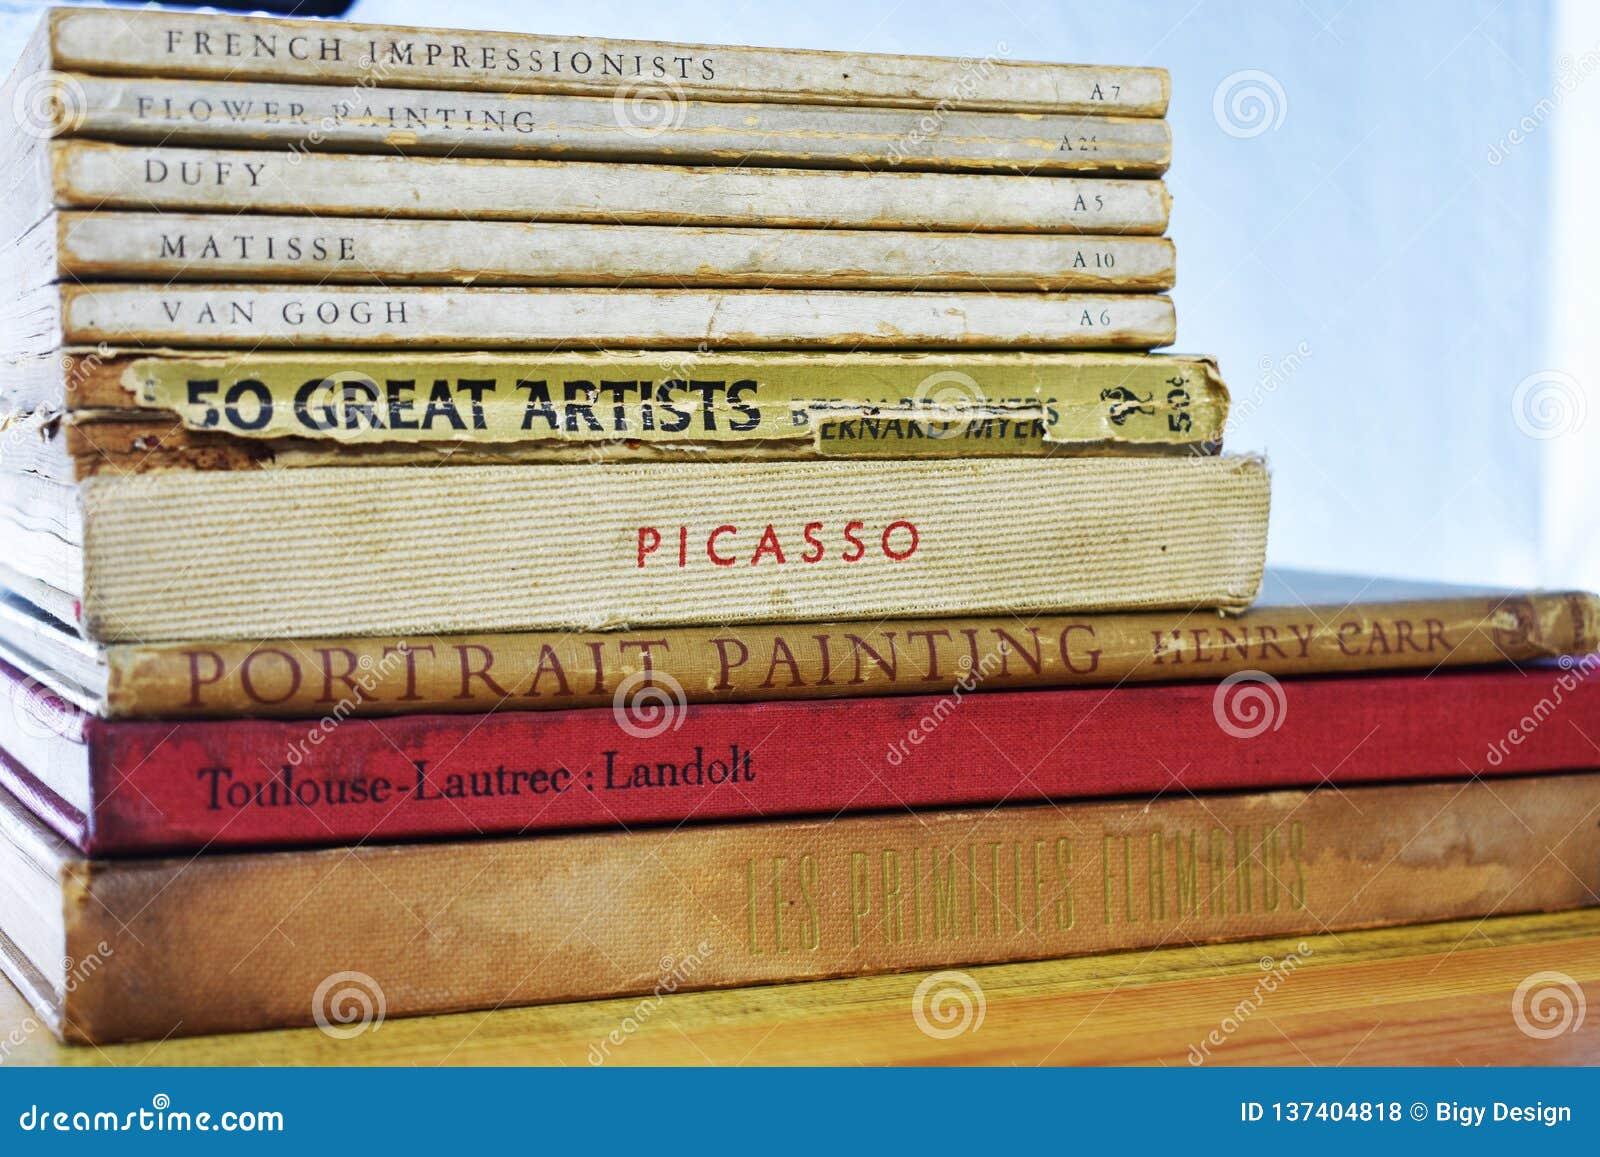 Oude Schilder Books - Dufy, Matisse, Van Gogh Picasso